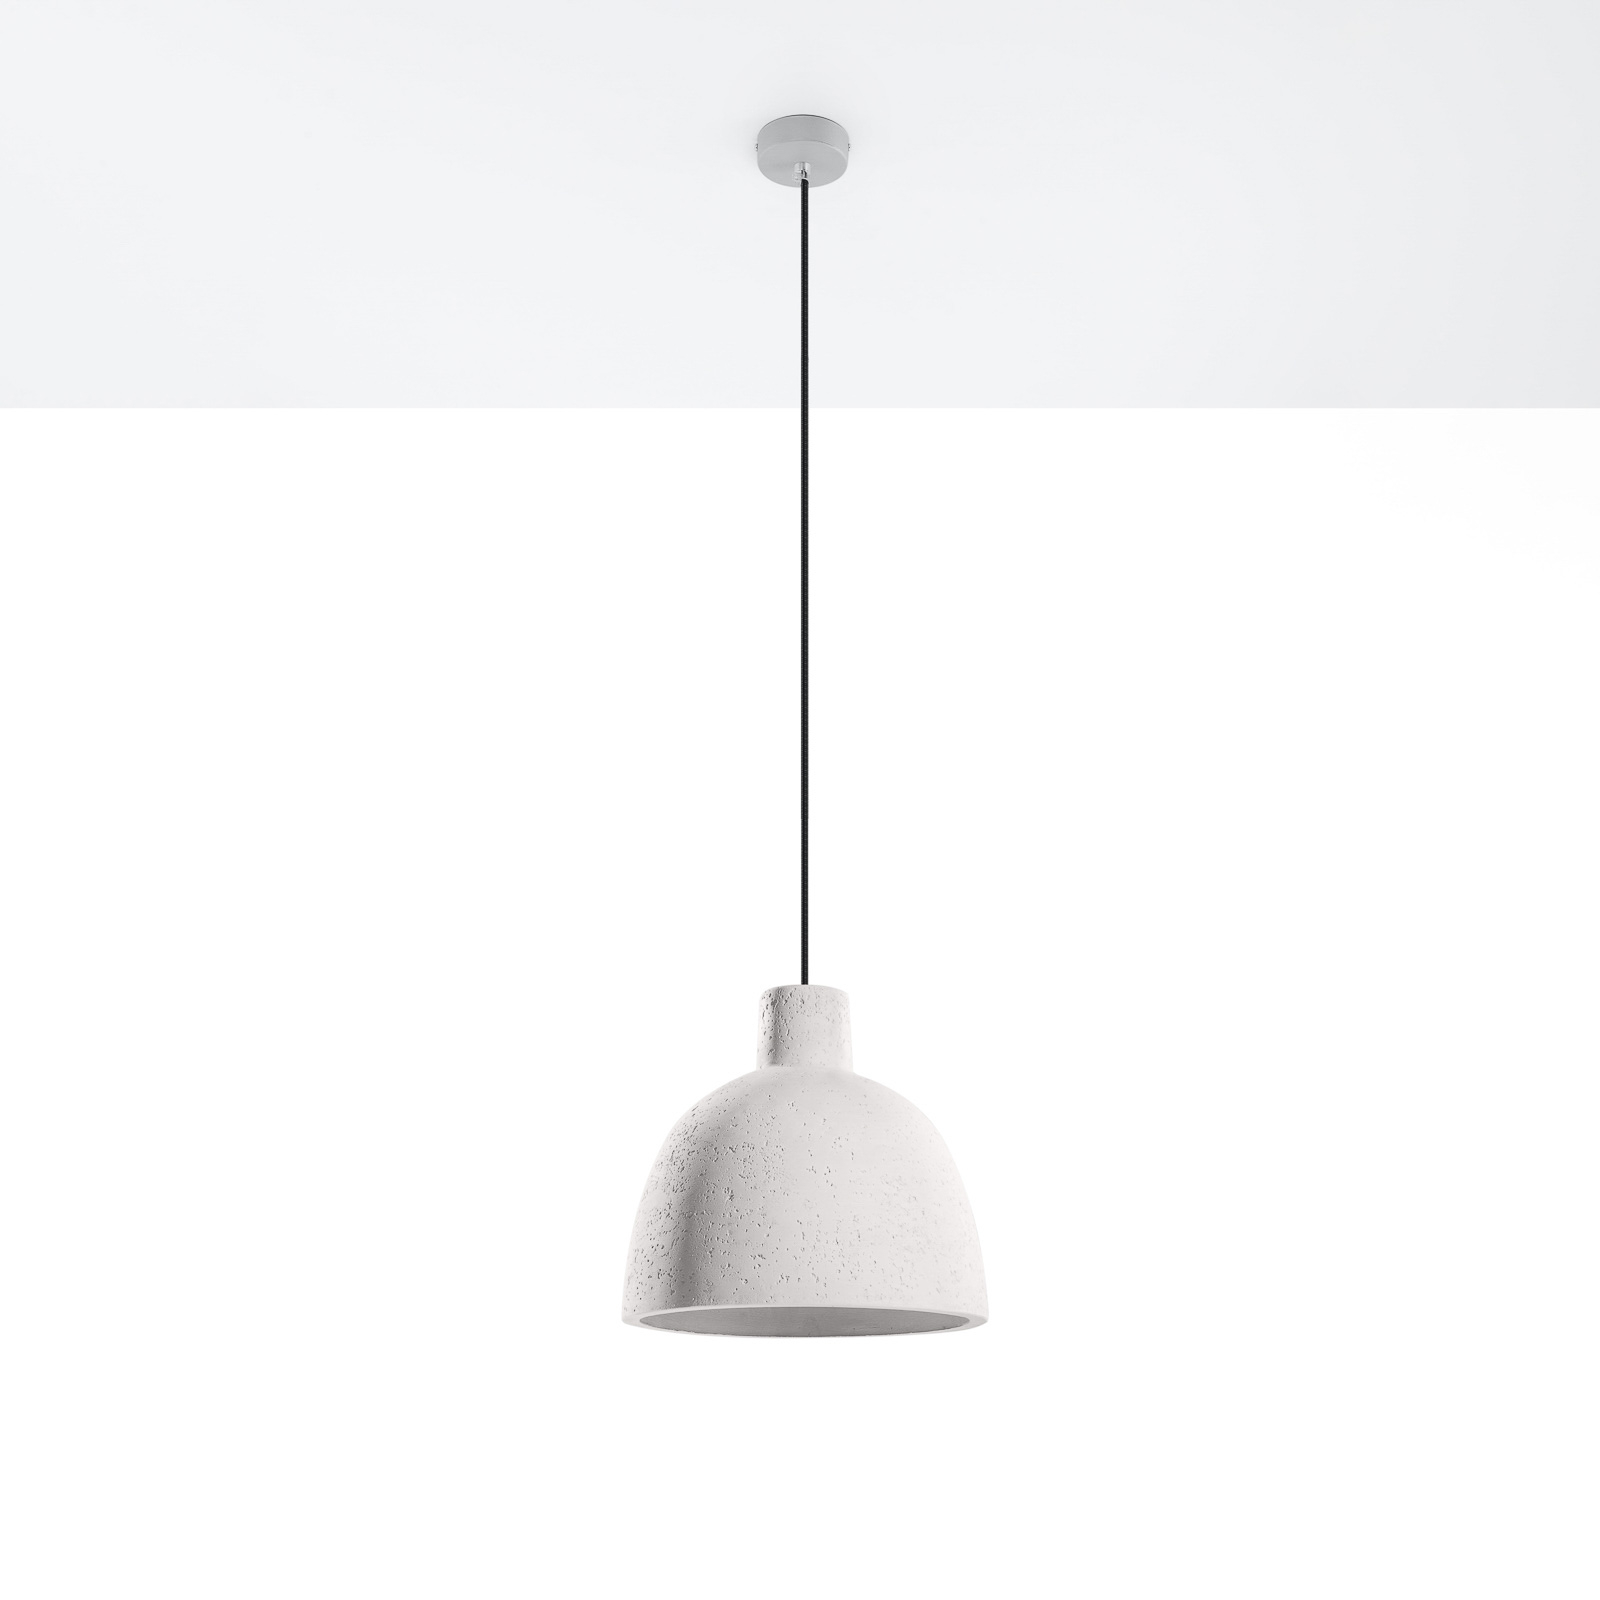 Hanglamp Cona van beton, Ø 28 cm